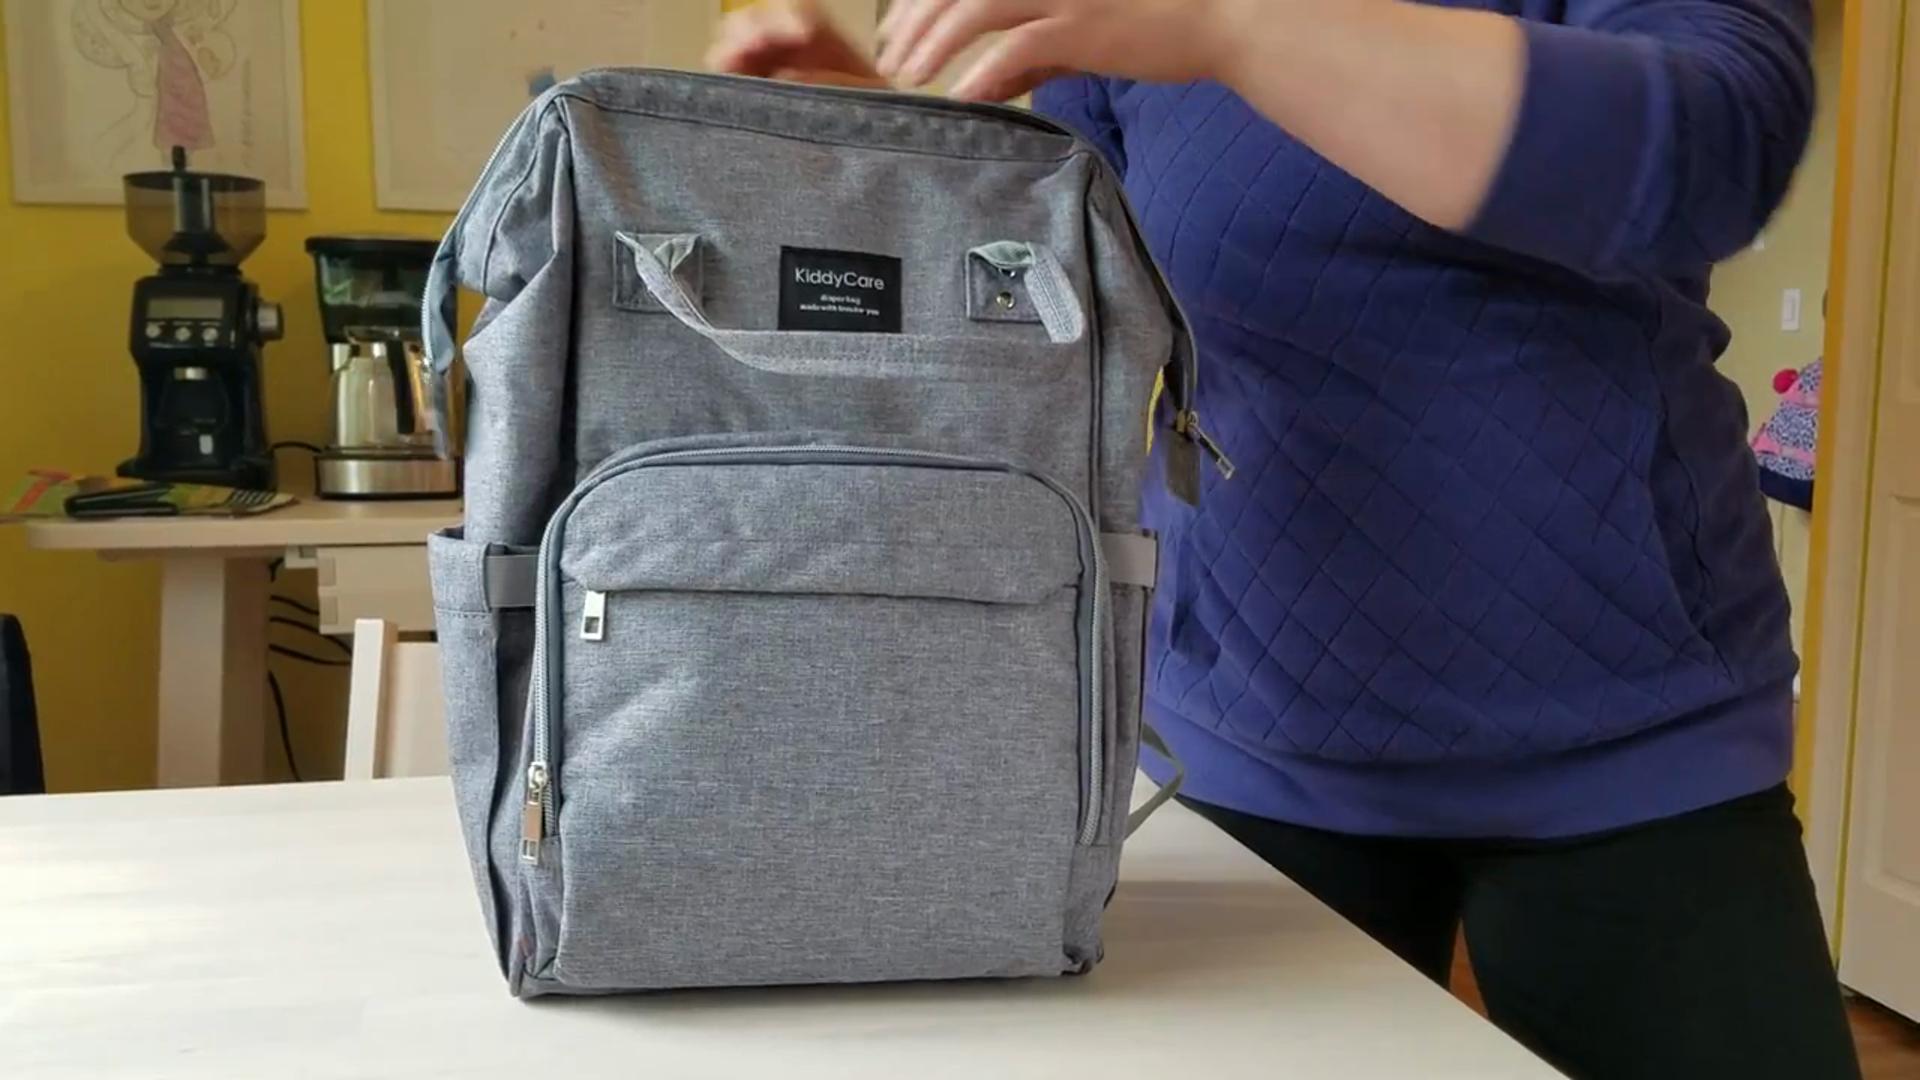 a4e6041f4412c KiddyCare diaper bag backpack review